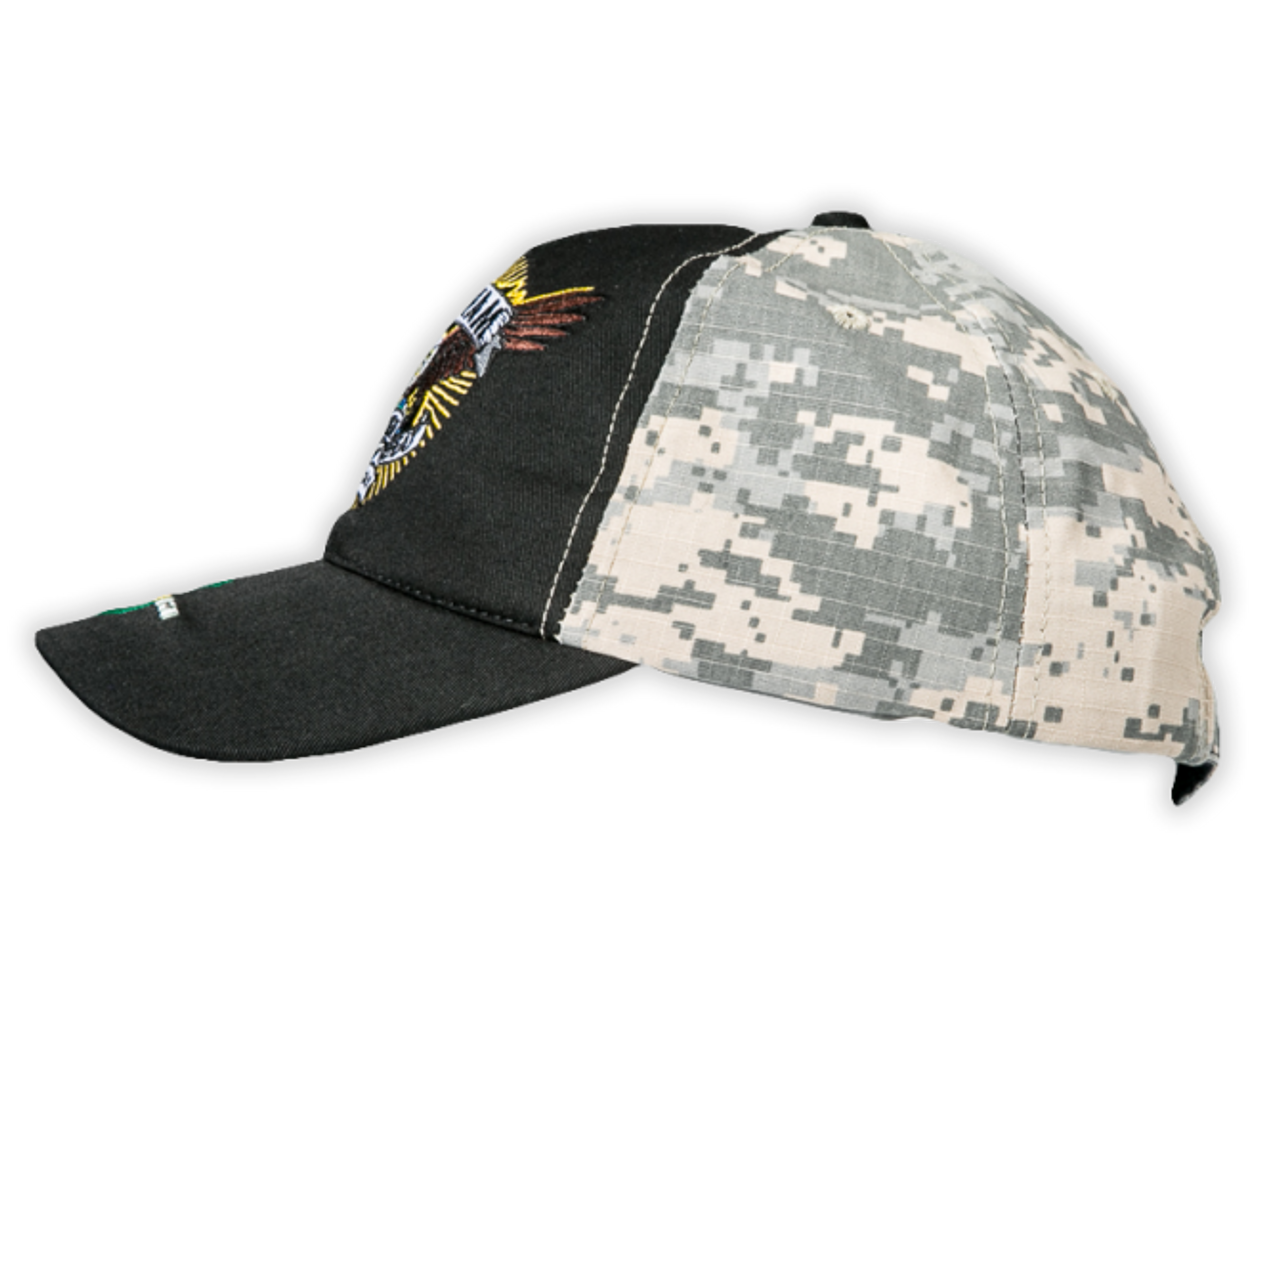 304da11244328 ... 23404 - Made In USA Military Hat - Vietnam Veteran - Defender ...